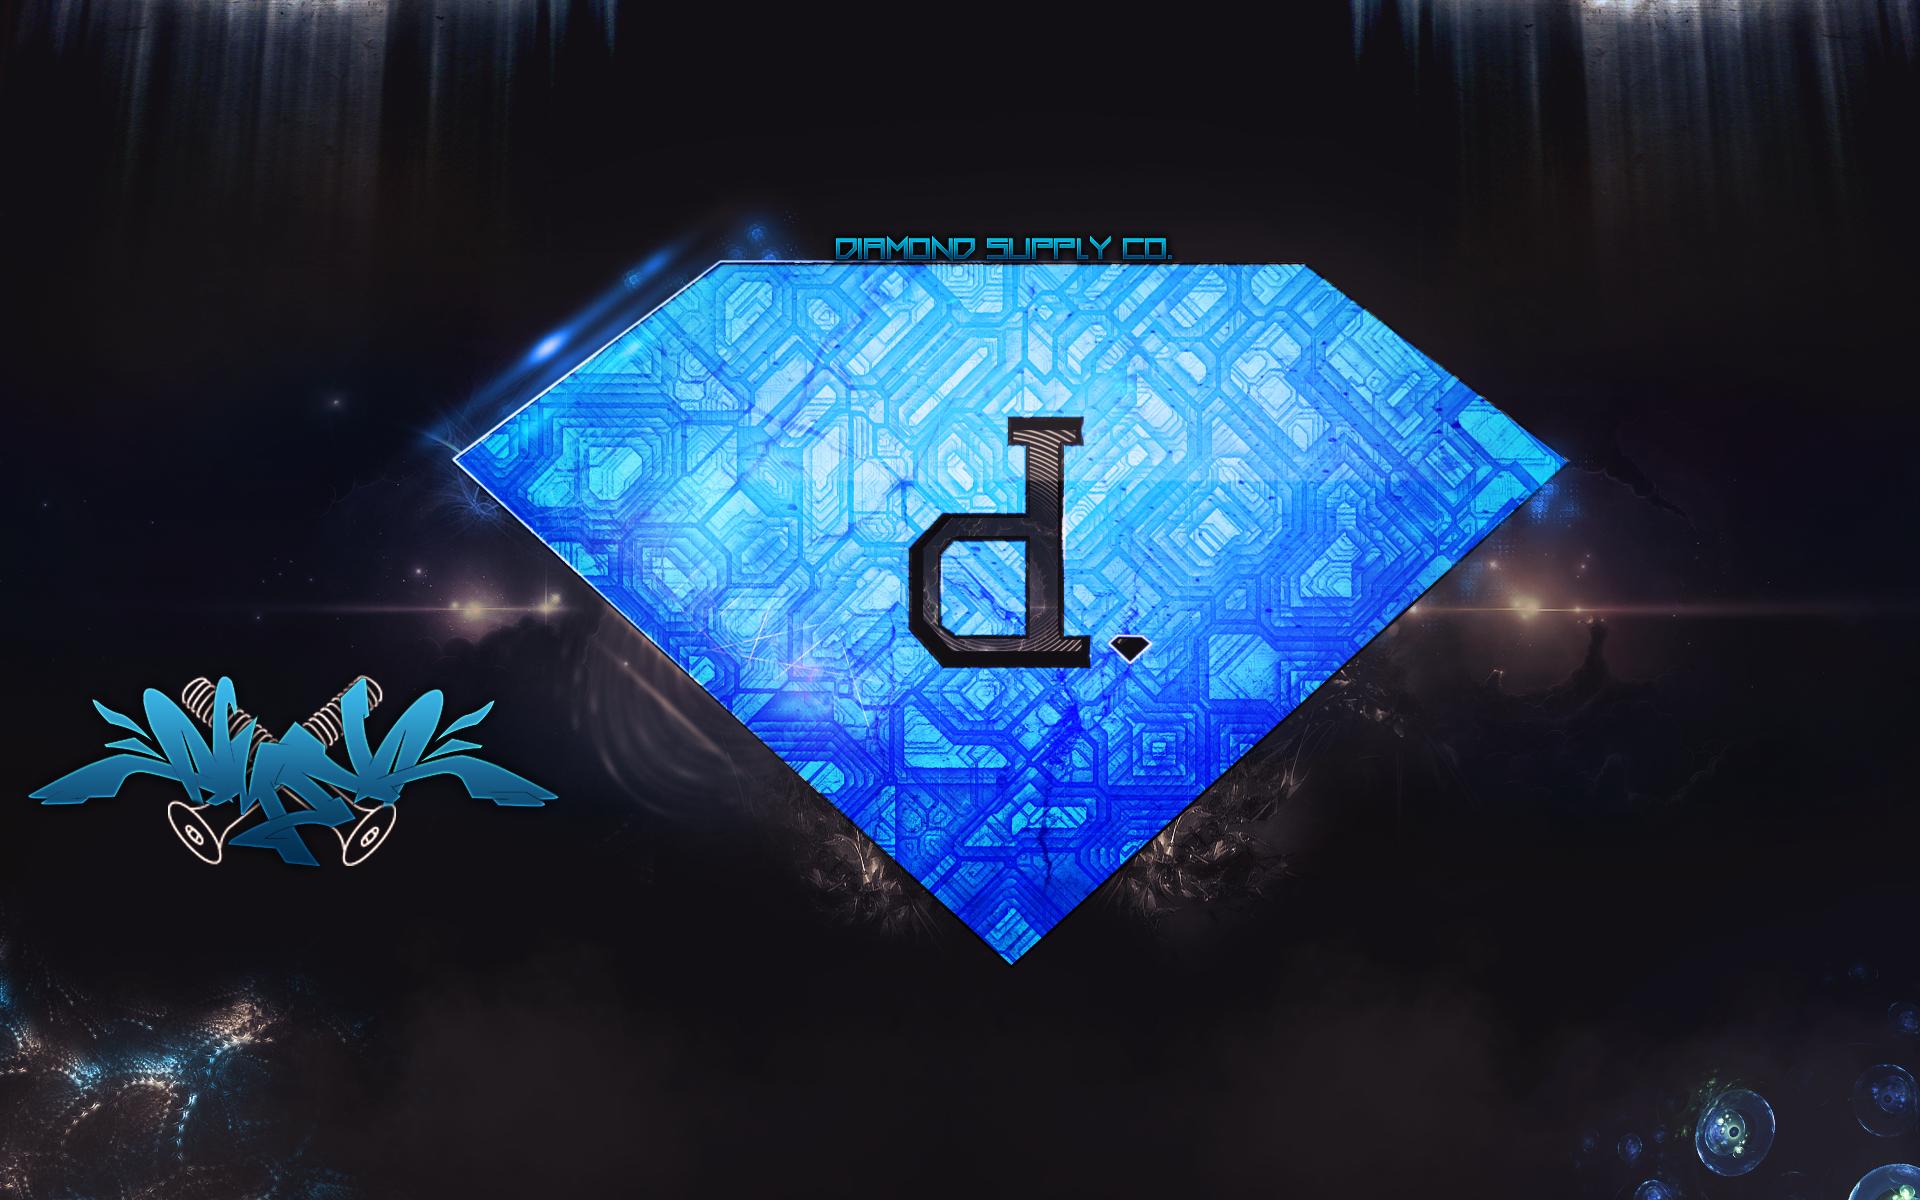 Diamond Supply Co Wallpaper by FlowDesiigns 1920x1200